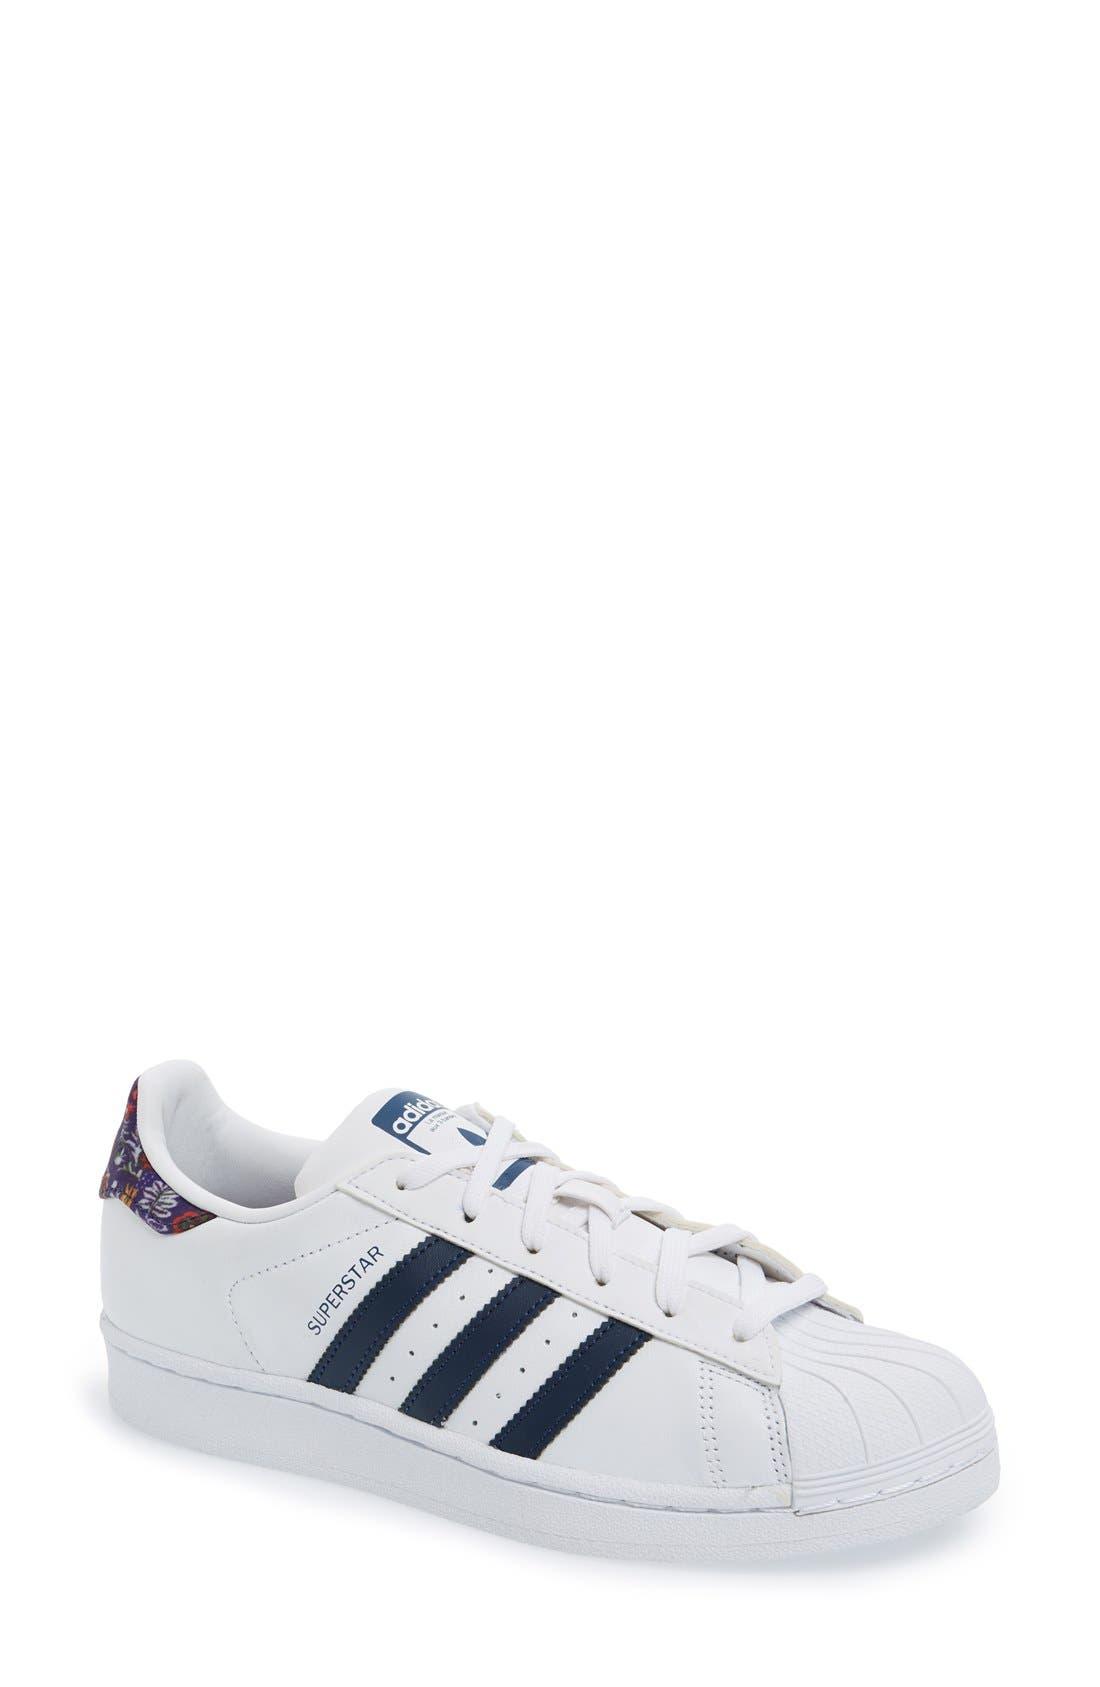 Main Image - adidas x The FARM Company Superstar Sneaker